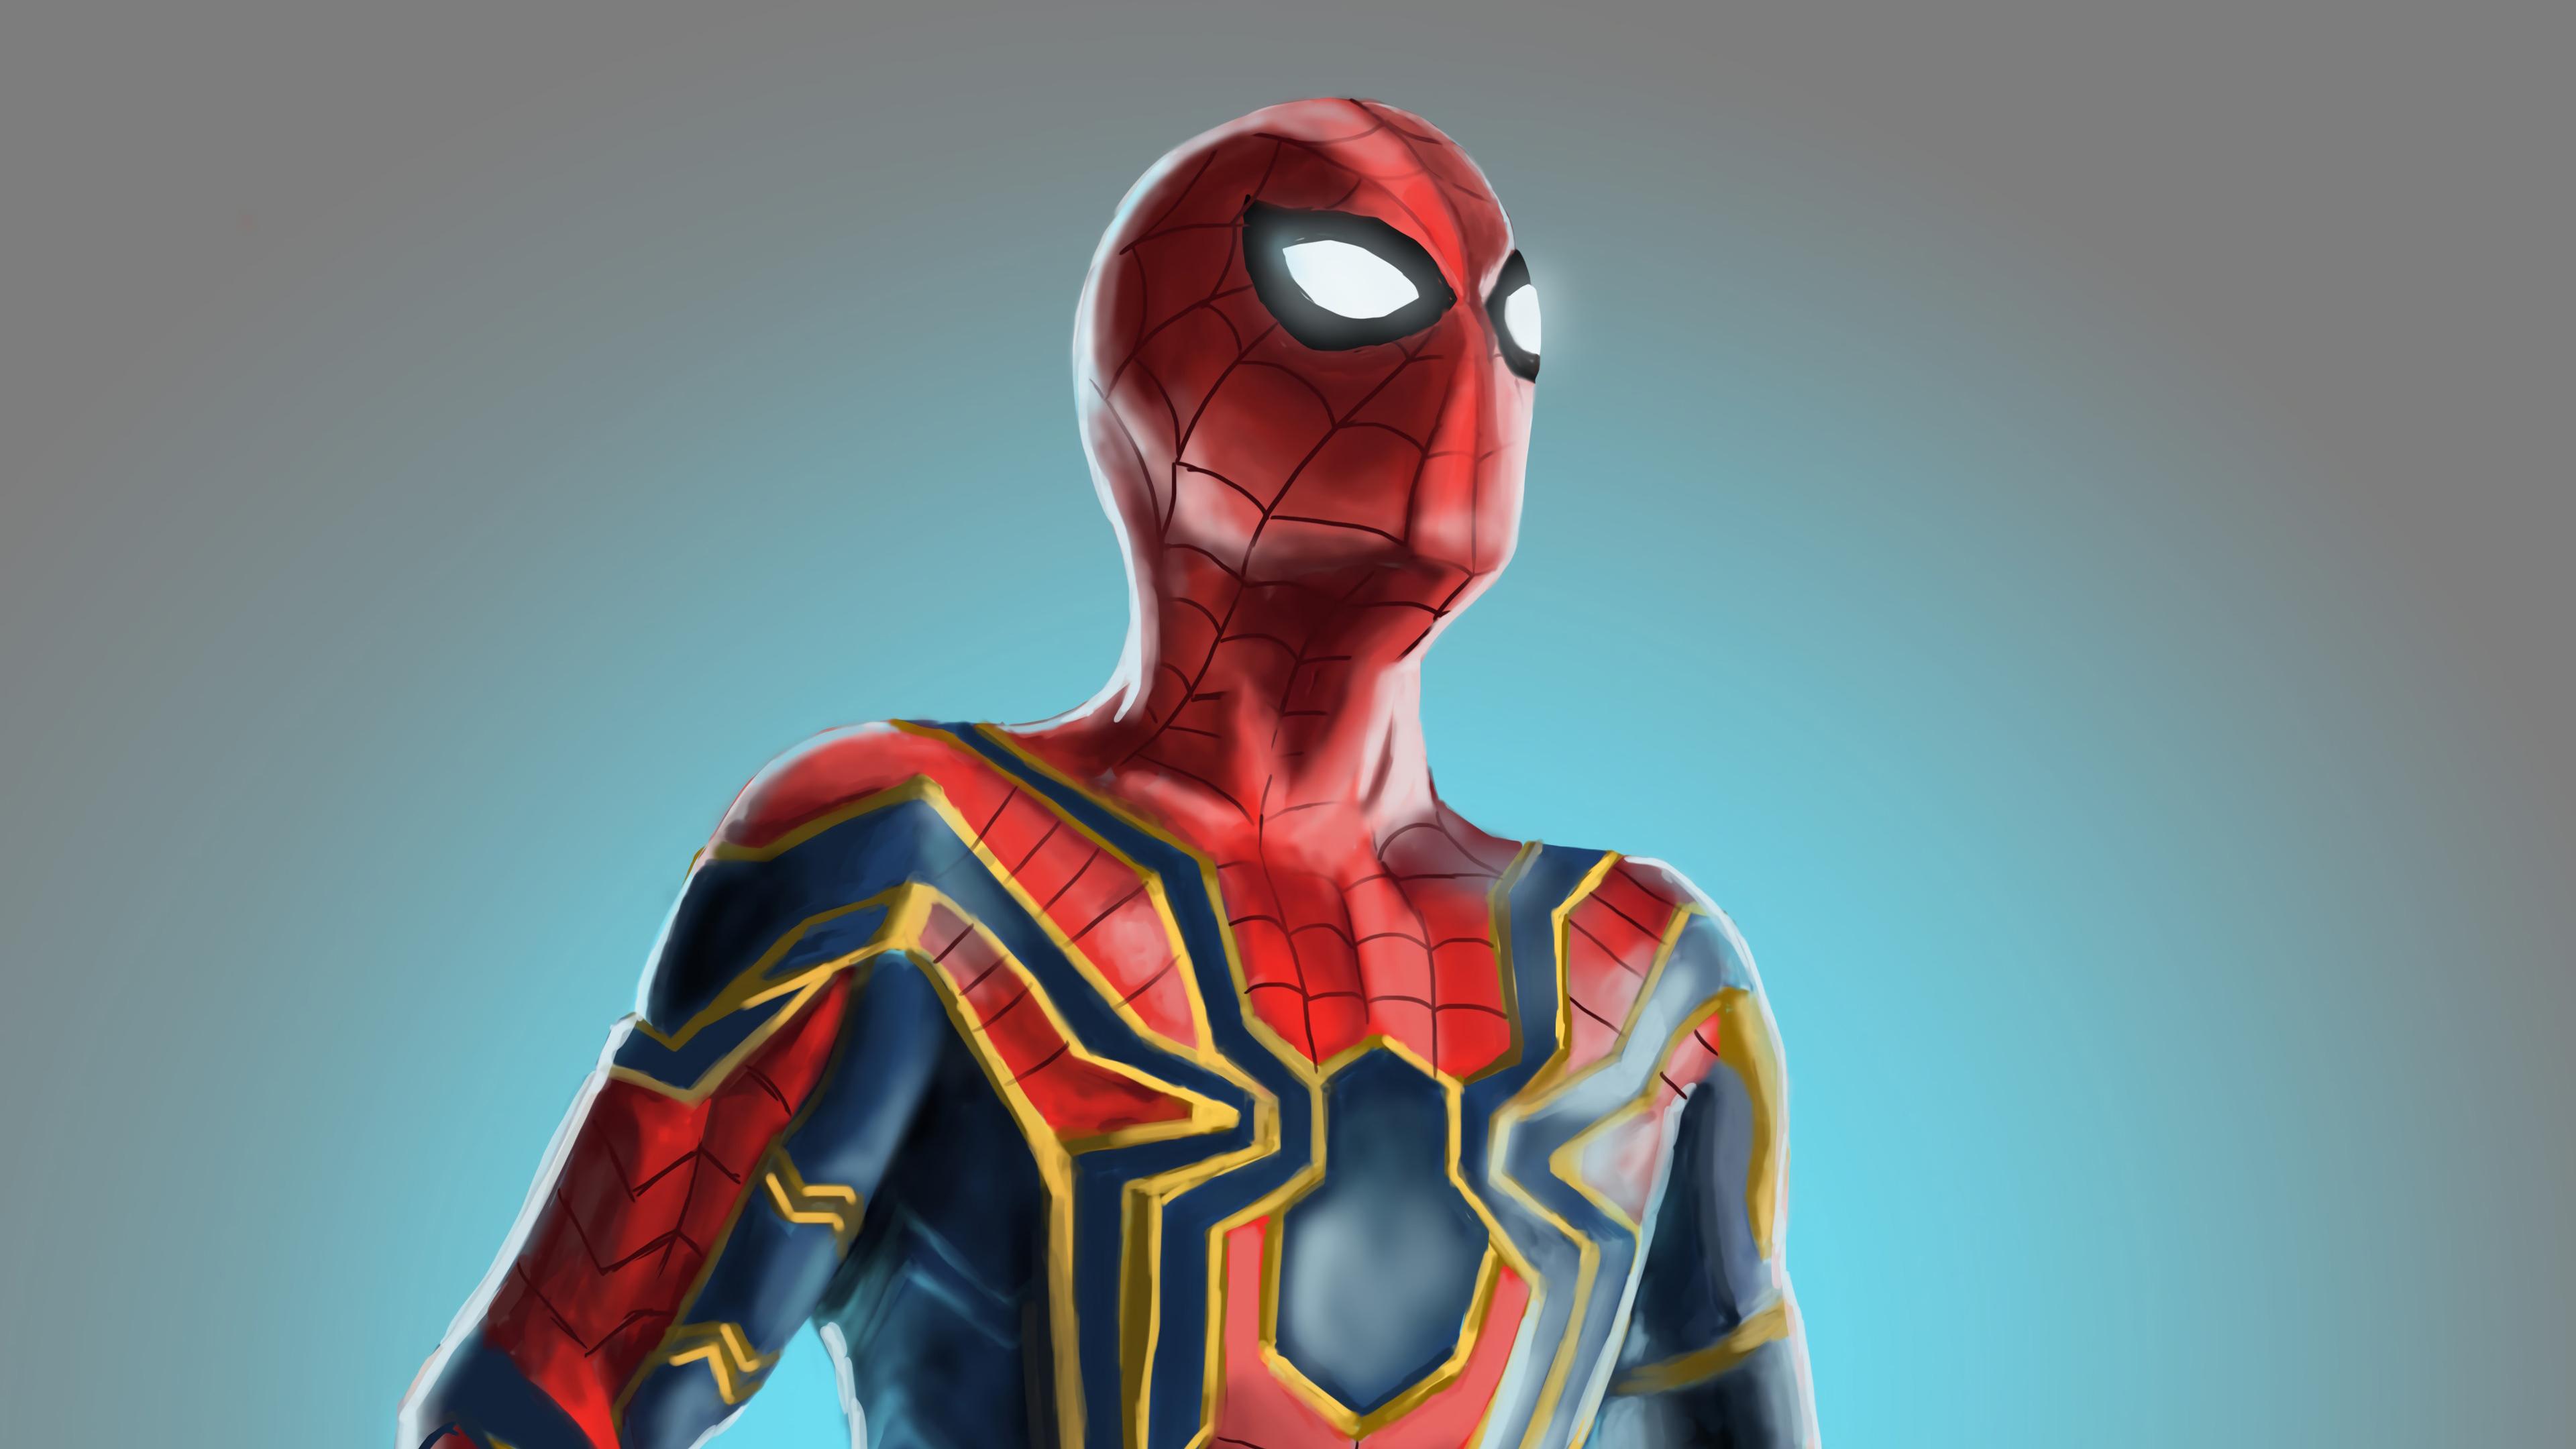 iron spiderman 1568054738 - Iron Spiderman - superheroes wallpapers, spiderman wallpapers, hd-wallpapers, digital art wallpapers, artwork wallpapers, artstation wallpapers, art wallpapers, 4k-wallpapers